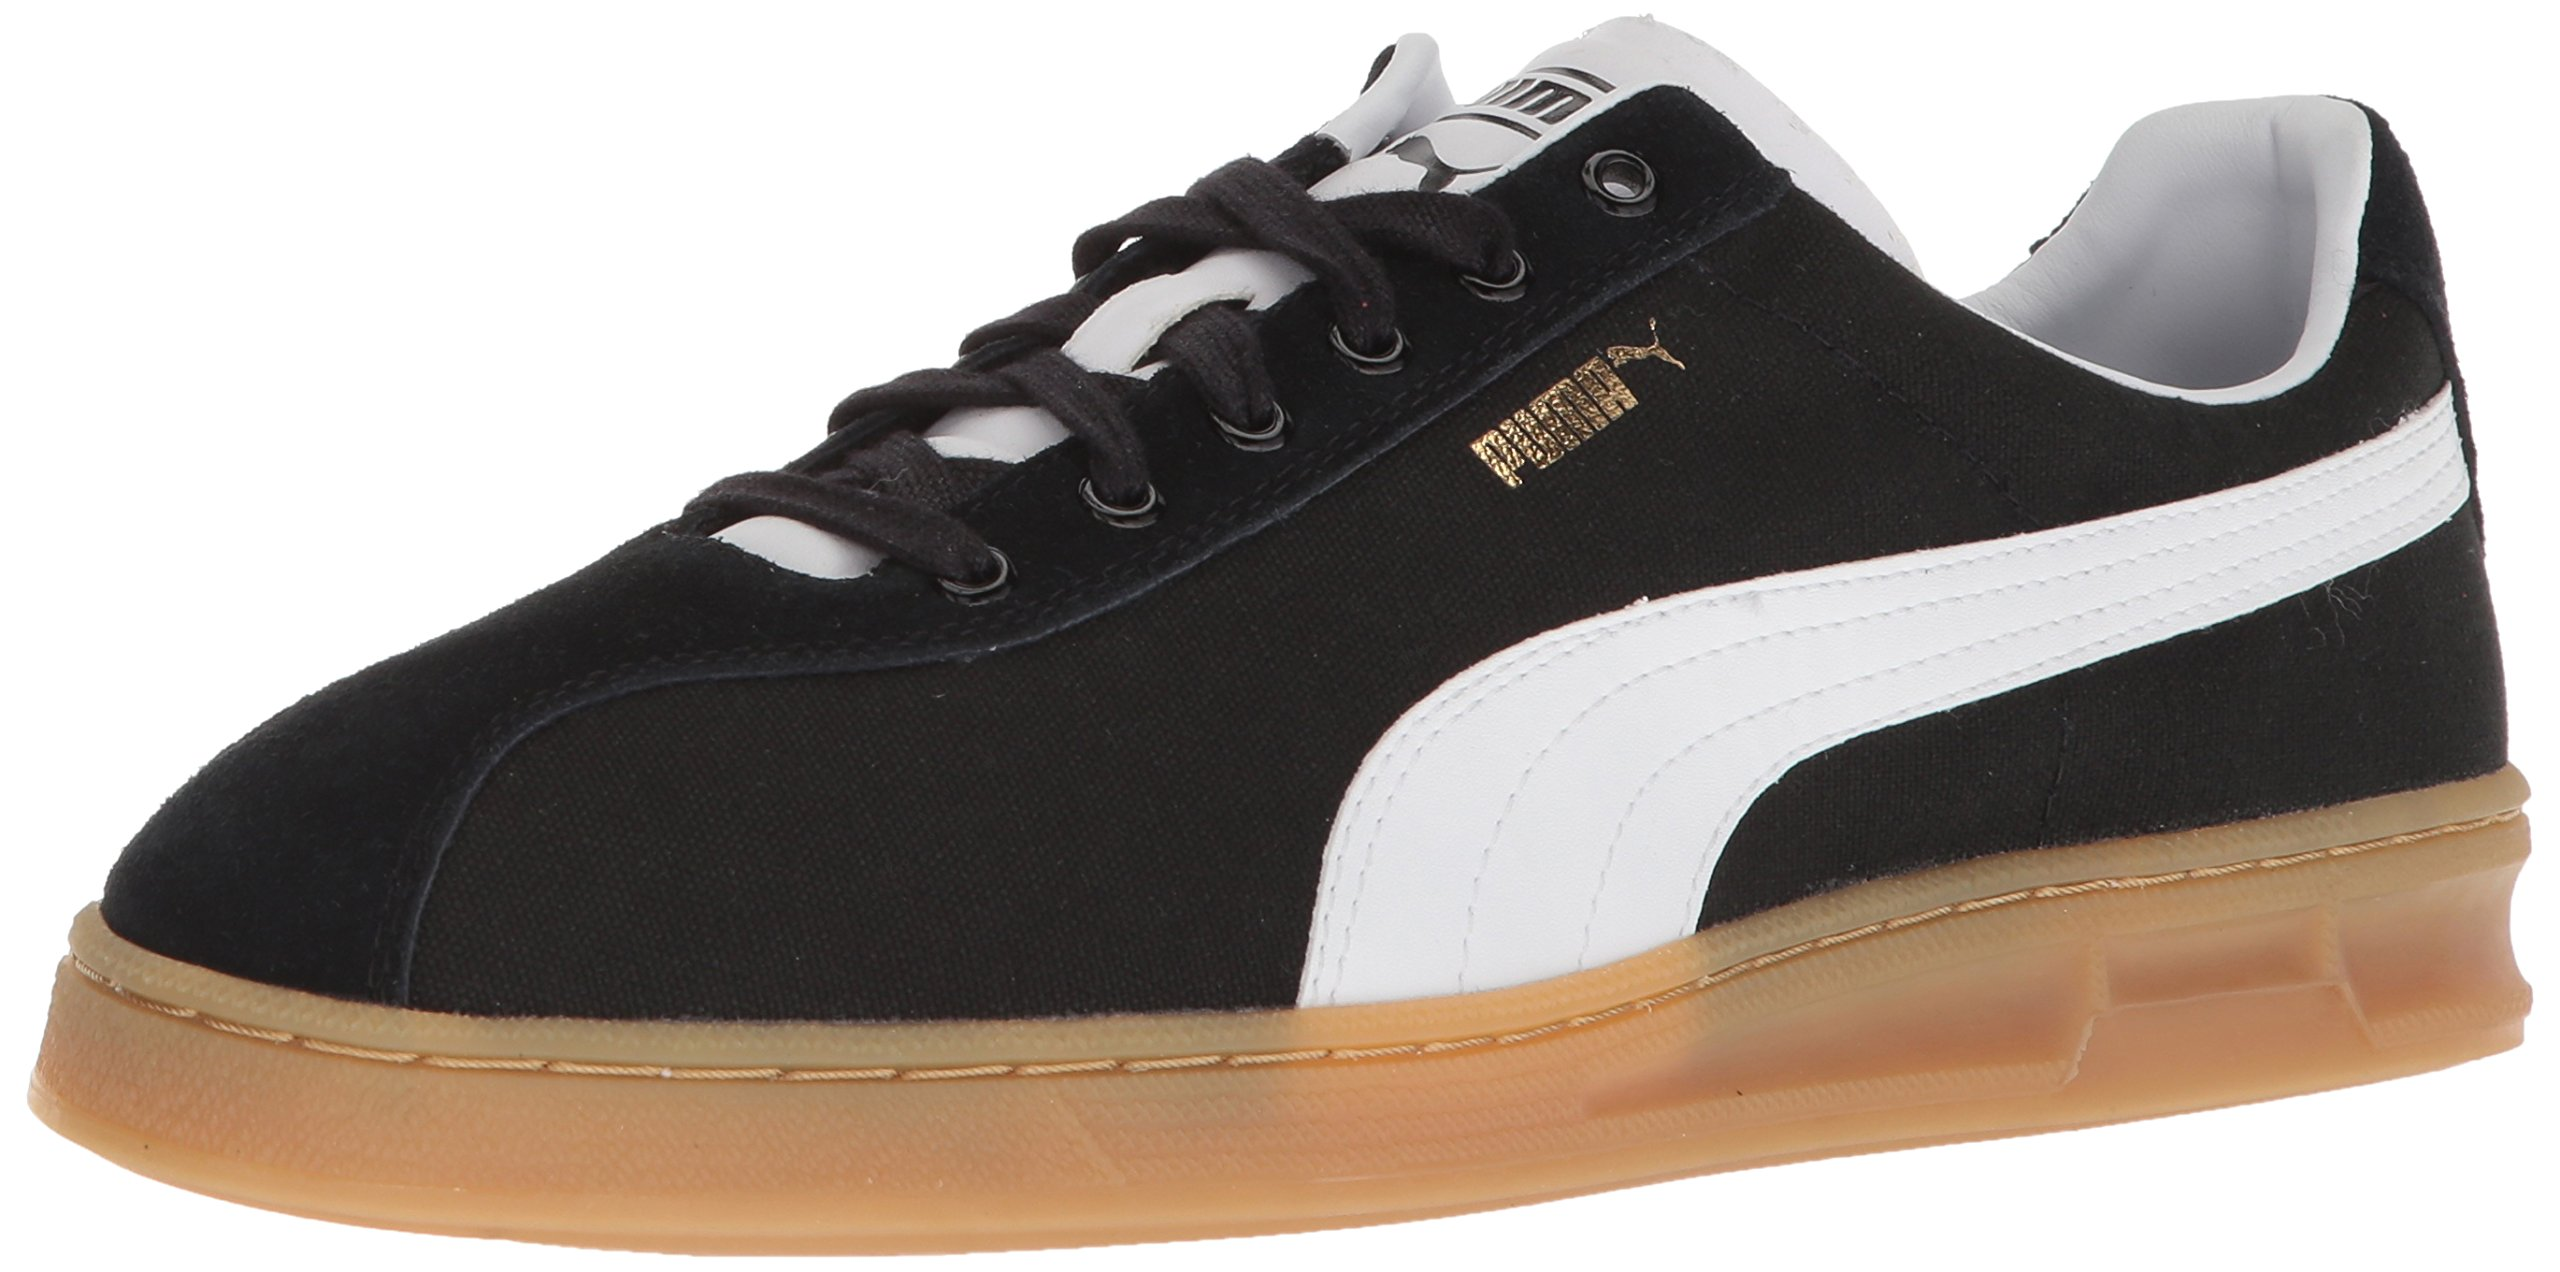 PUMA Men's TK Indoor Summer Sneaker, Black White, 8.5 M US